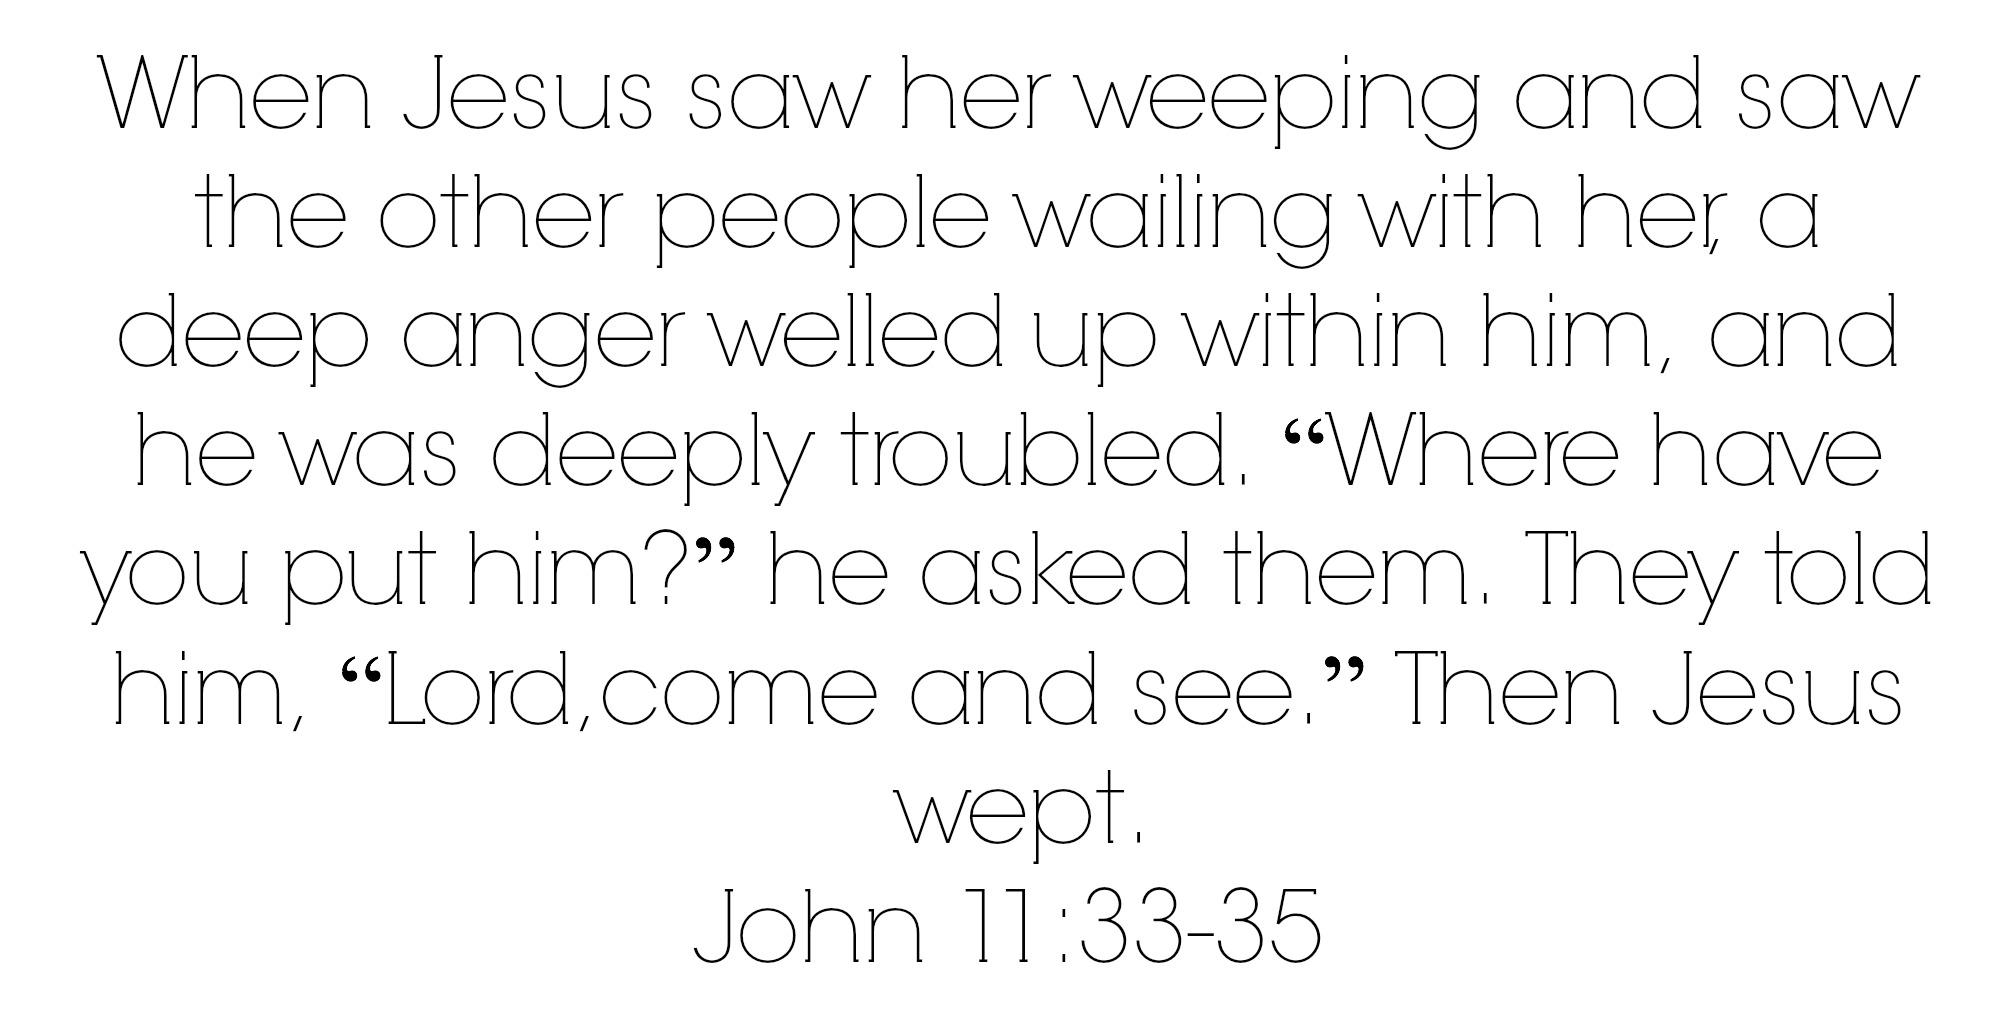 john 1133-35 jesus wept